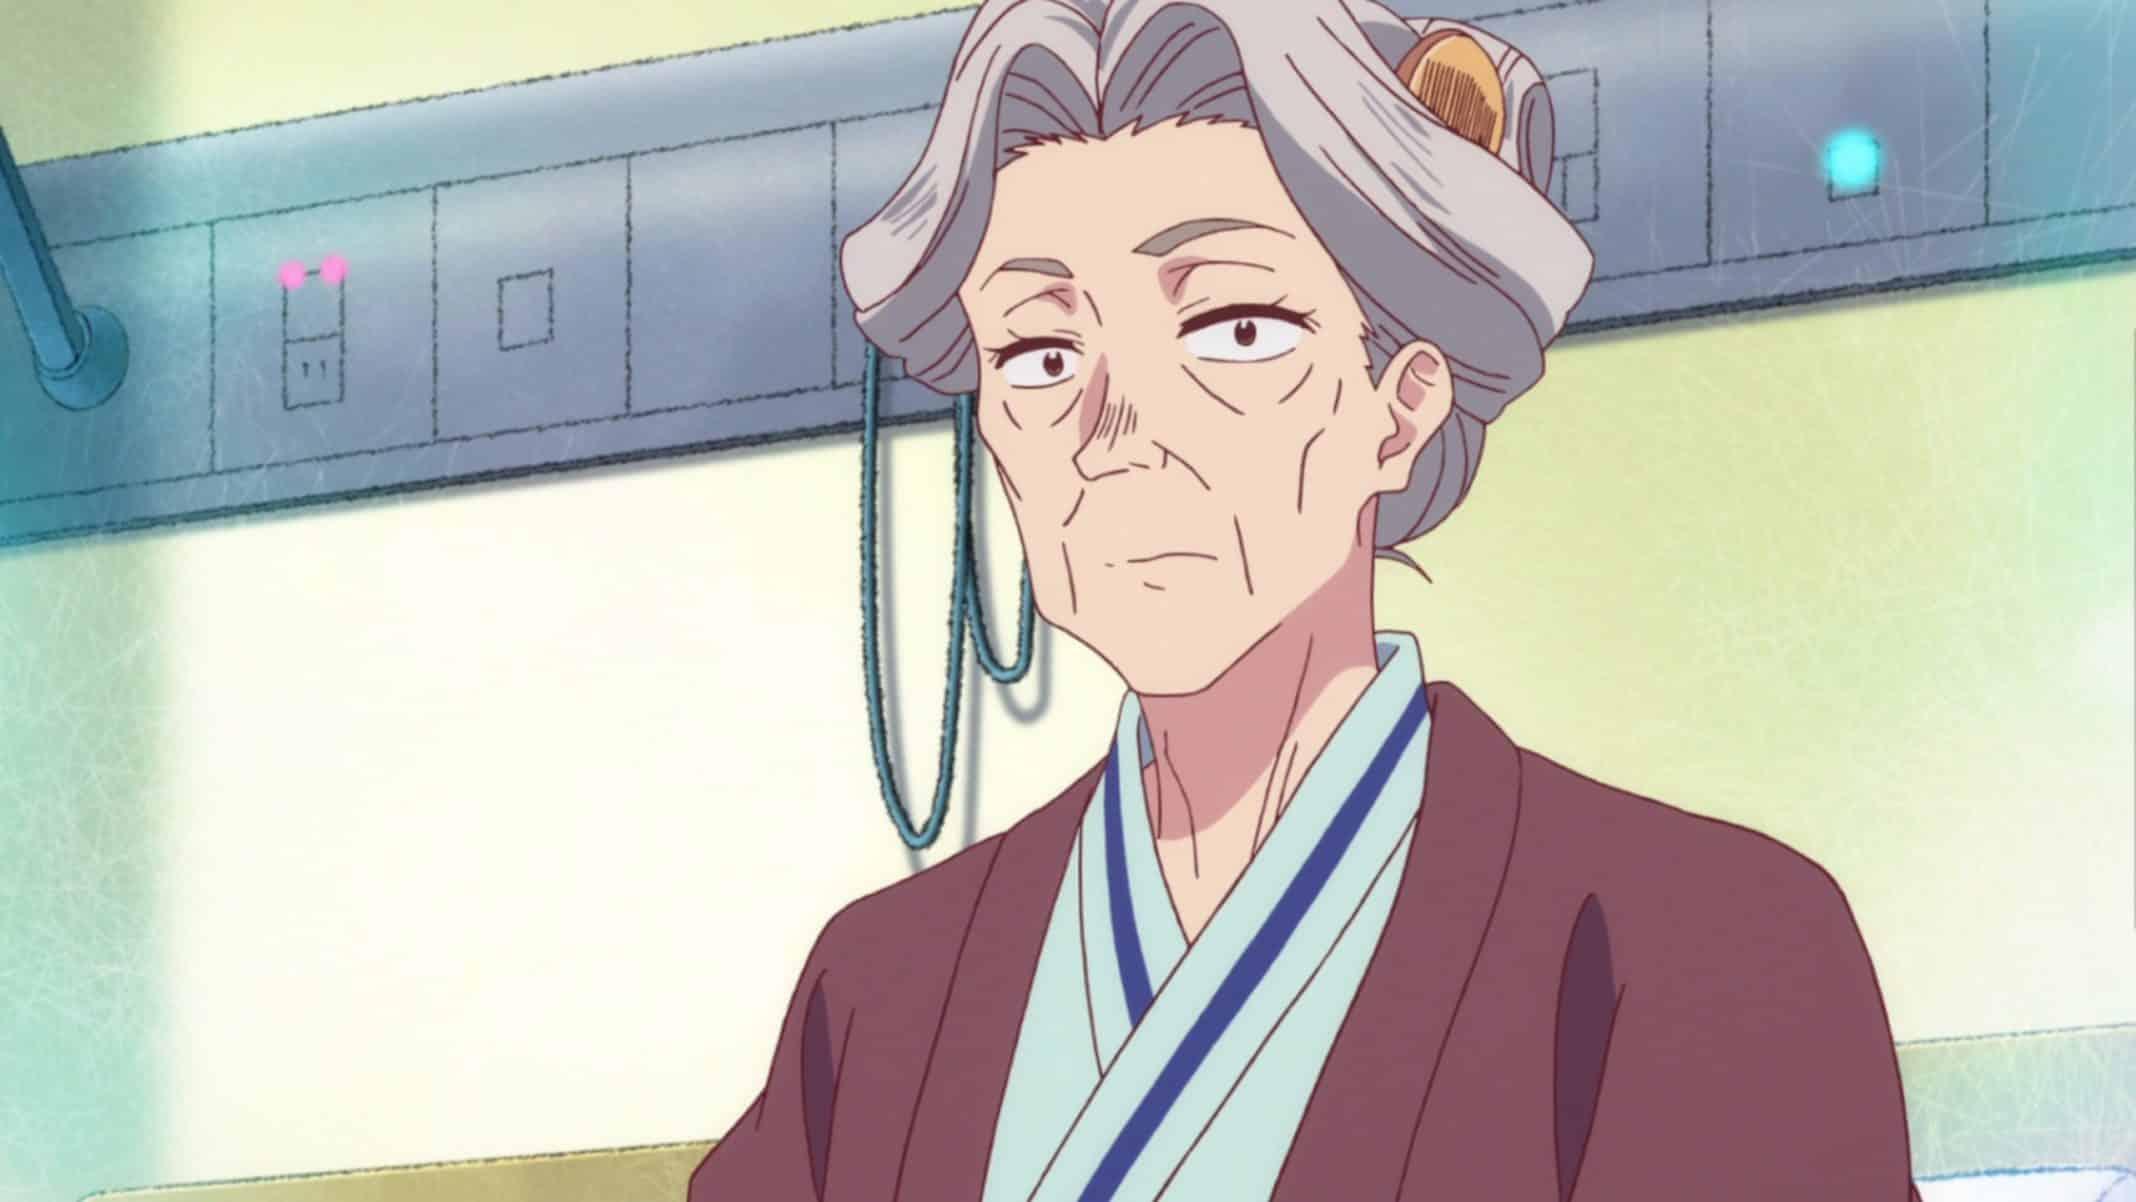 Grandma Kinoshita (Nozawa Yukari) in her hospital room.